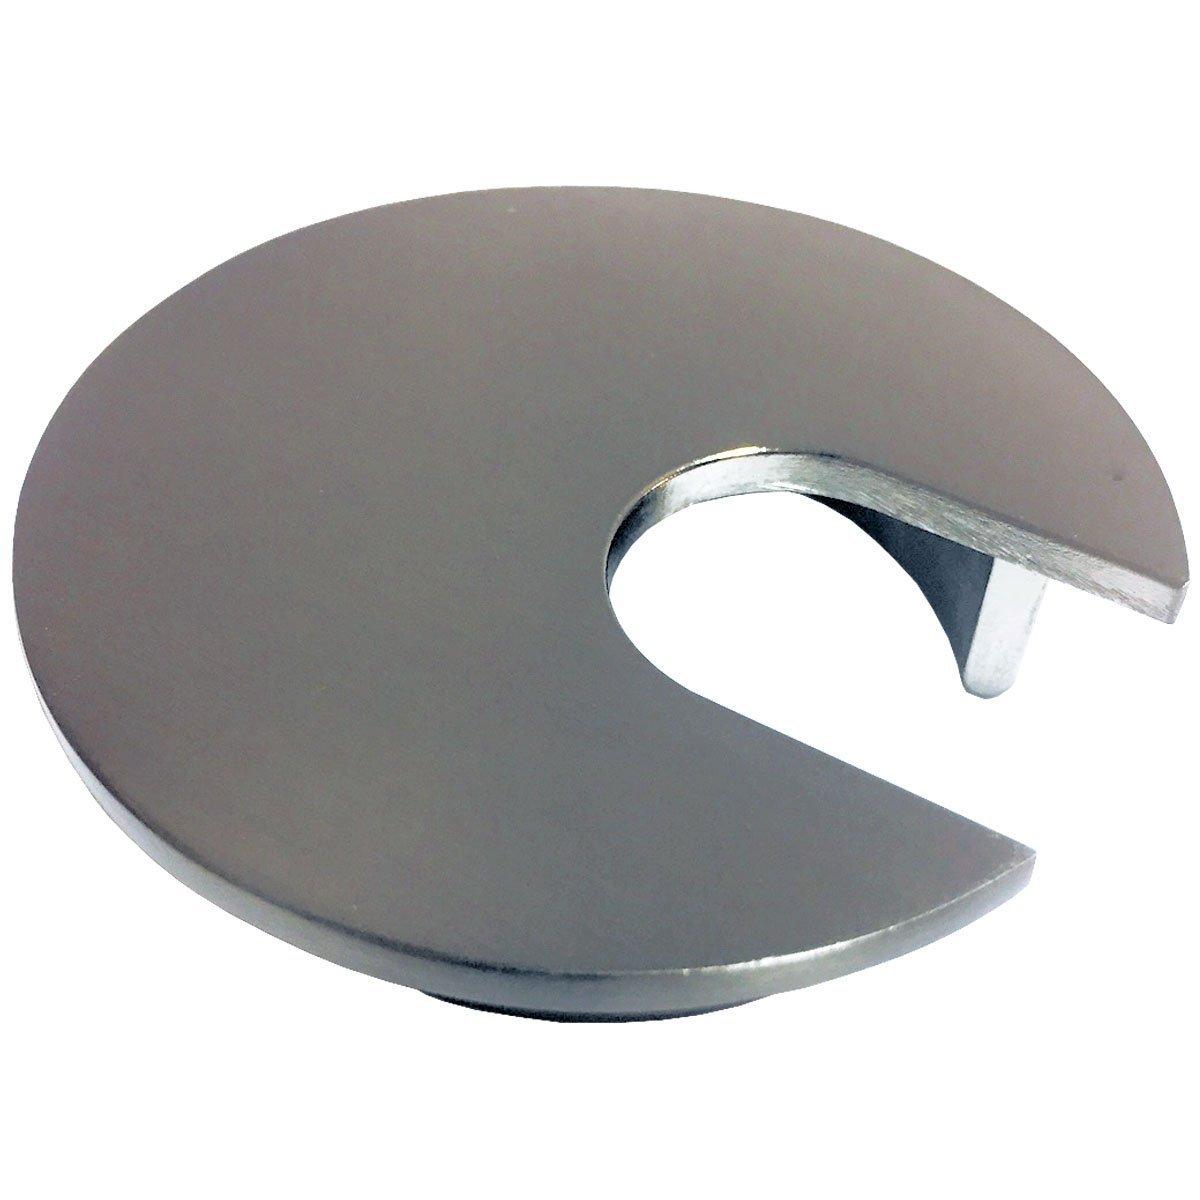 2'' Metal Desk Grommet - Color: Brushed Nickel - 3 Pieces